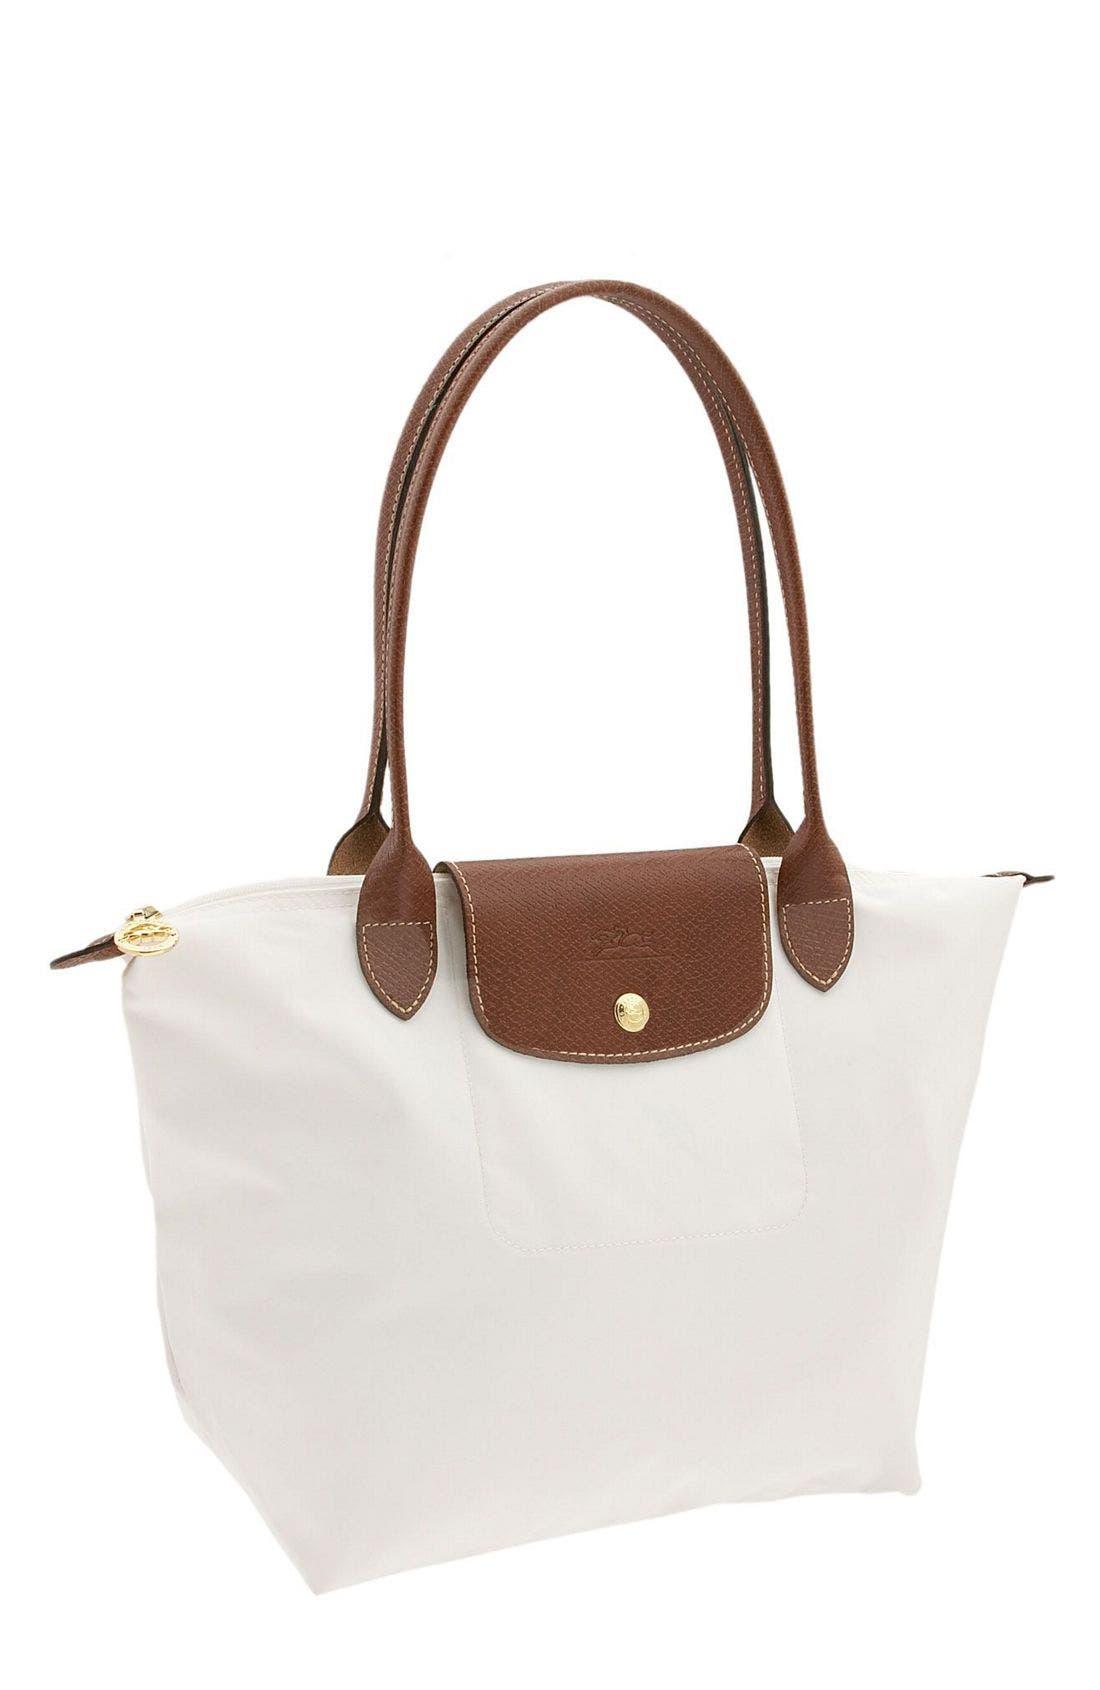 Main Image - Longchamp 'Le Pliage - Small' Shoulder Bag